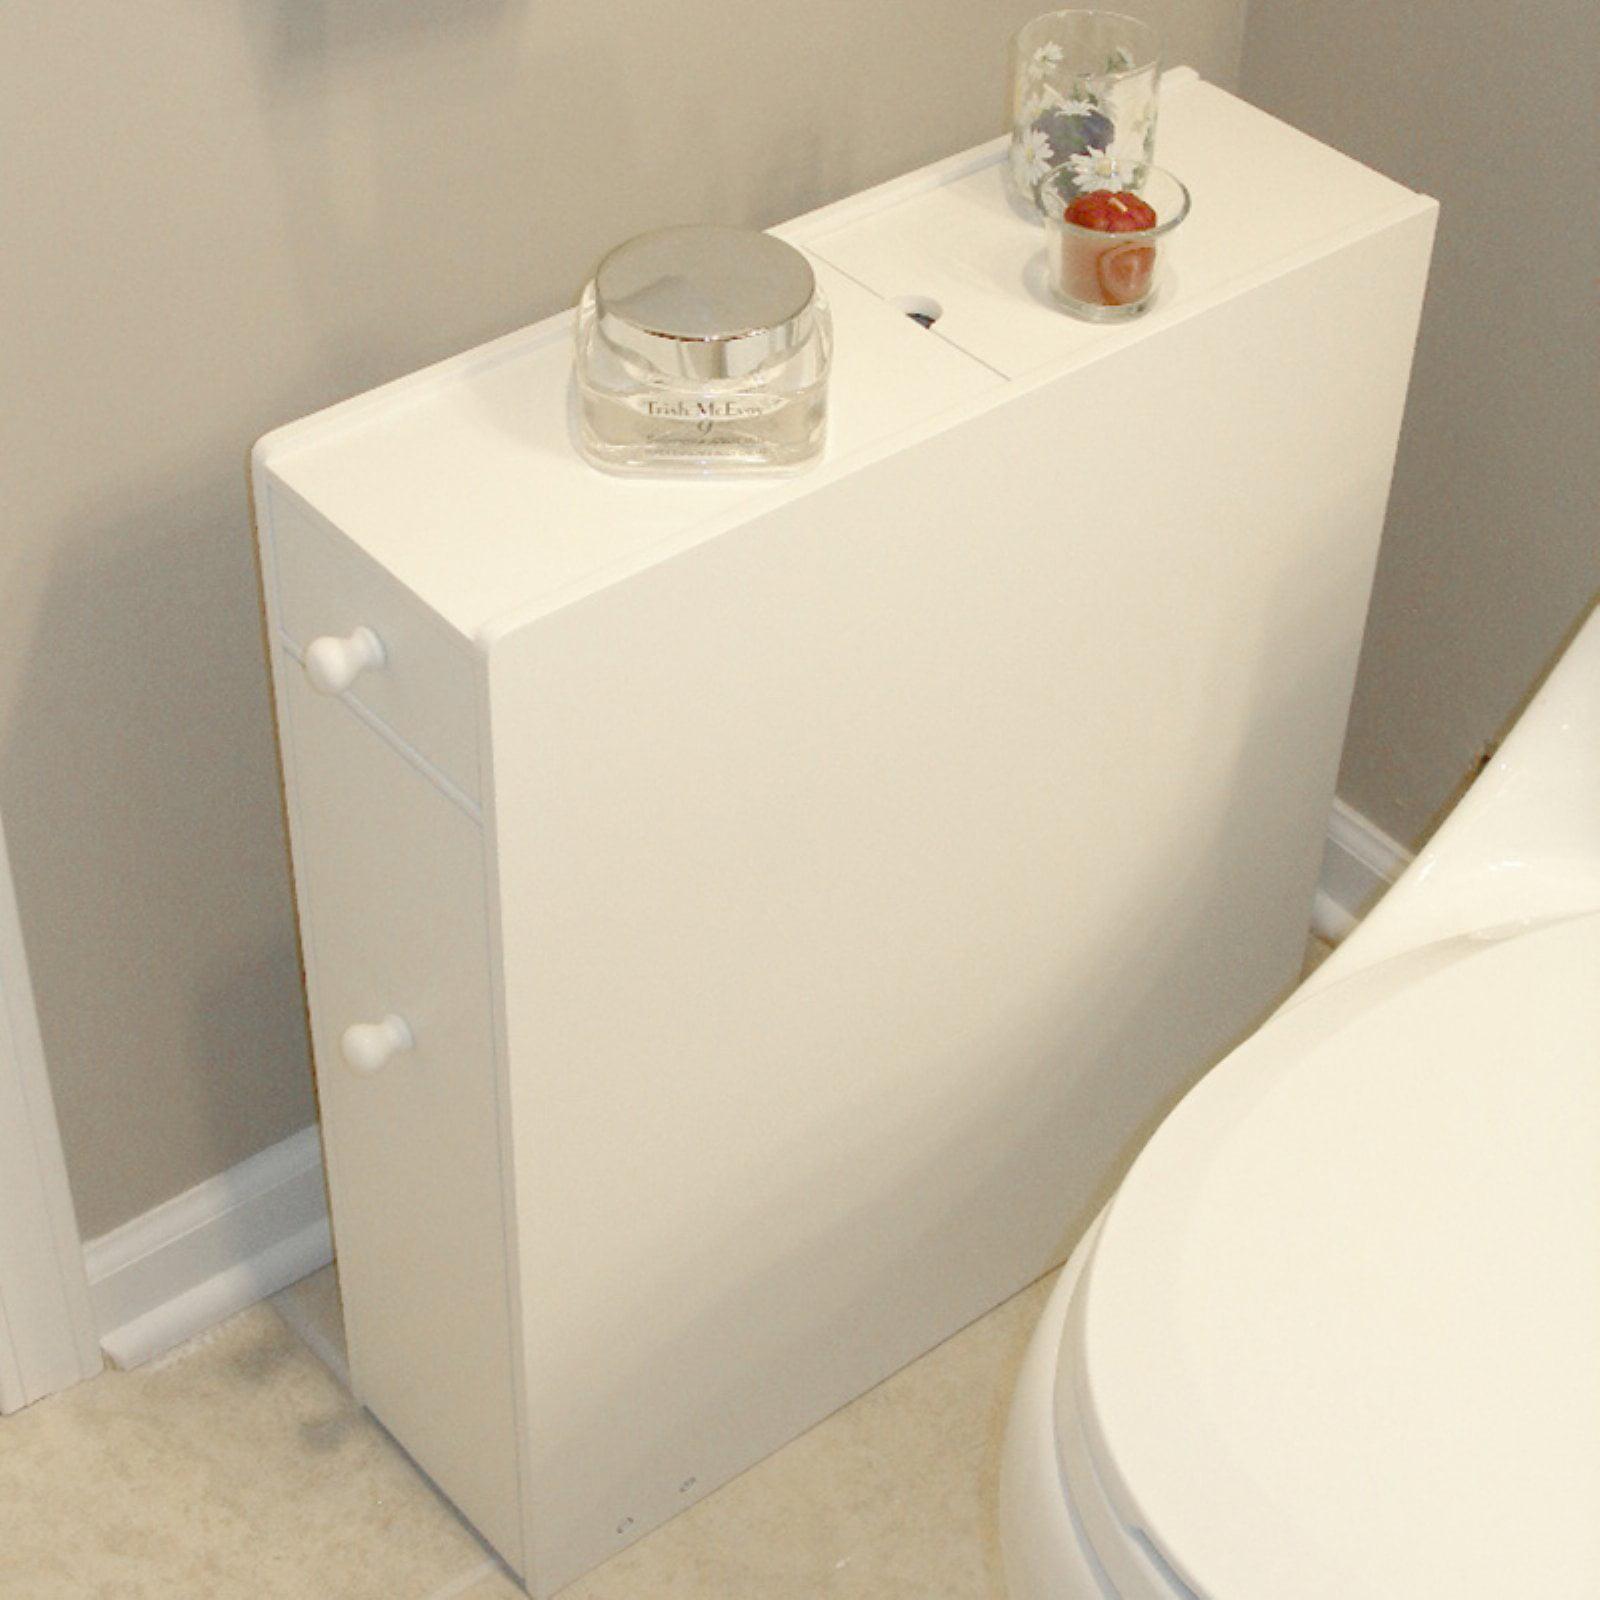 ZLMN46001 Bathroom Floor Cabinet in White